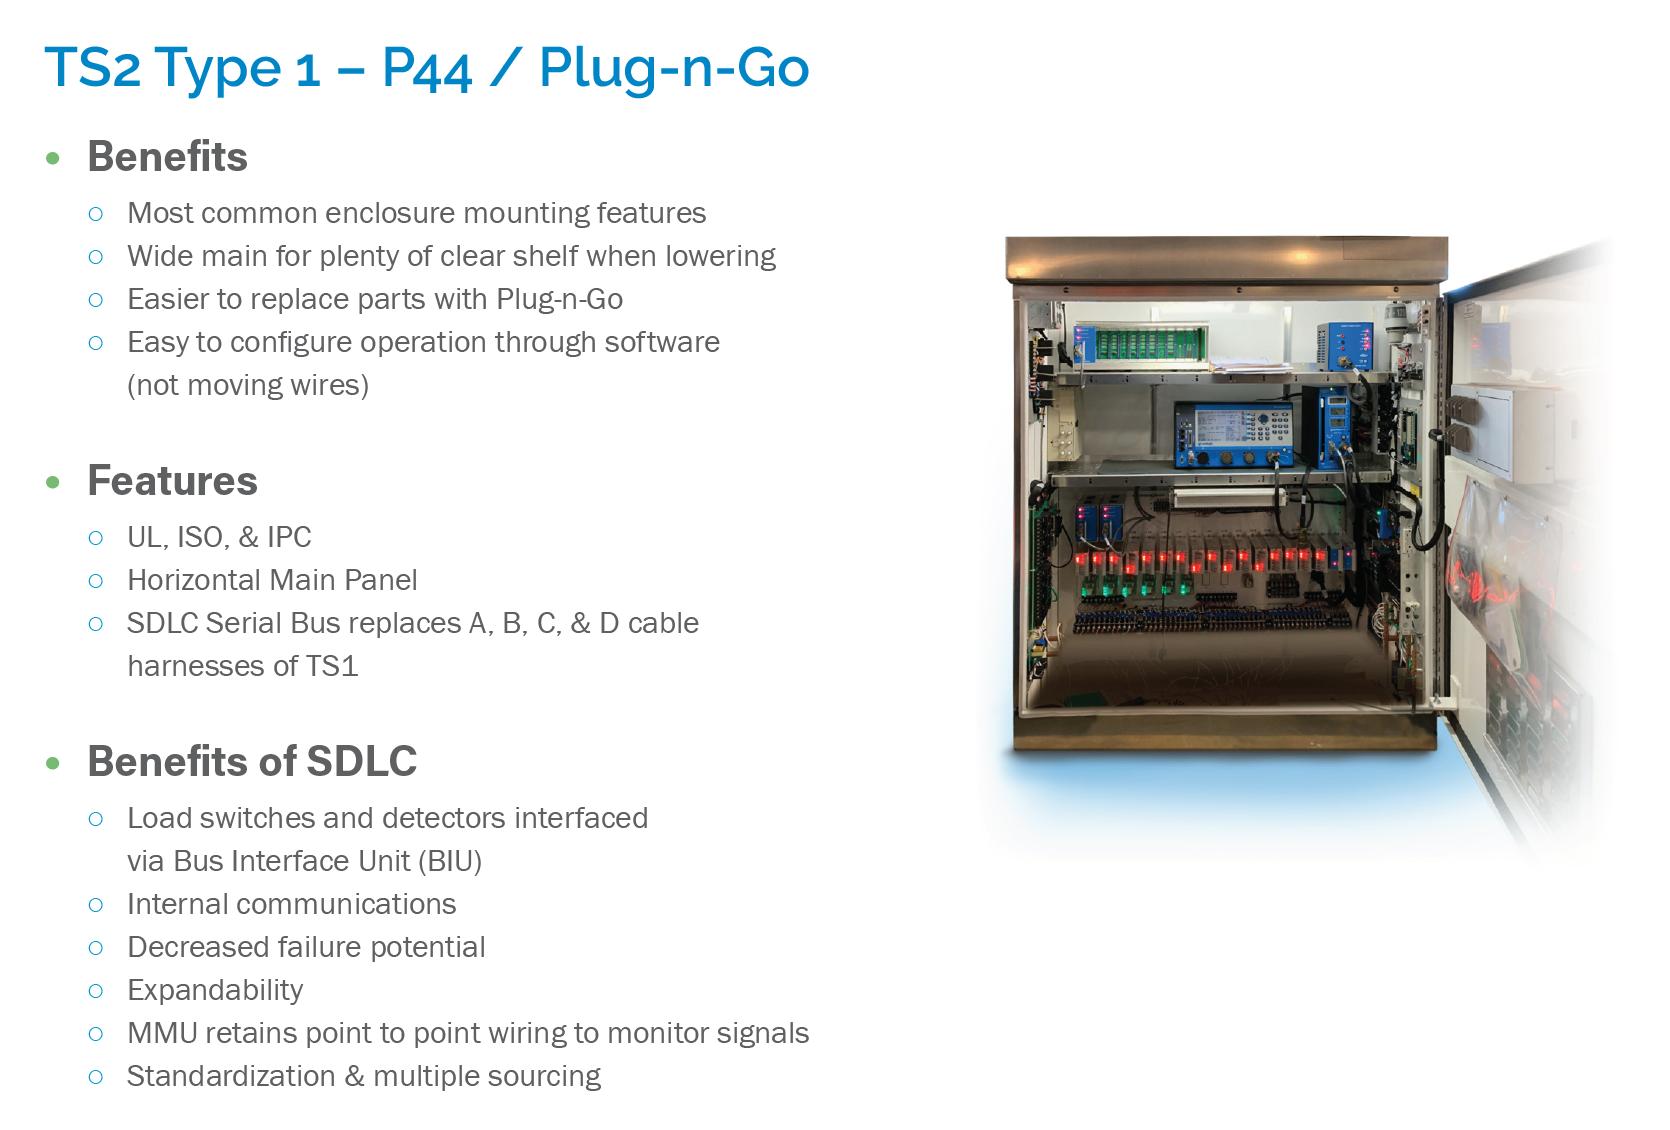 TS2 Type 1 – P44 / Plug-n-Go